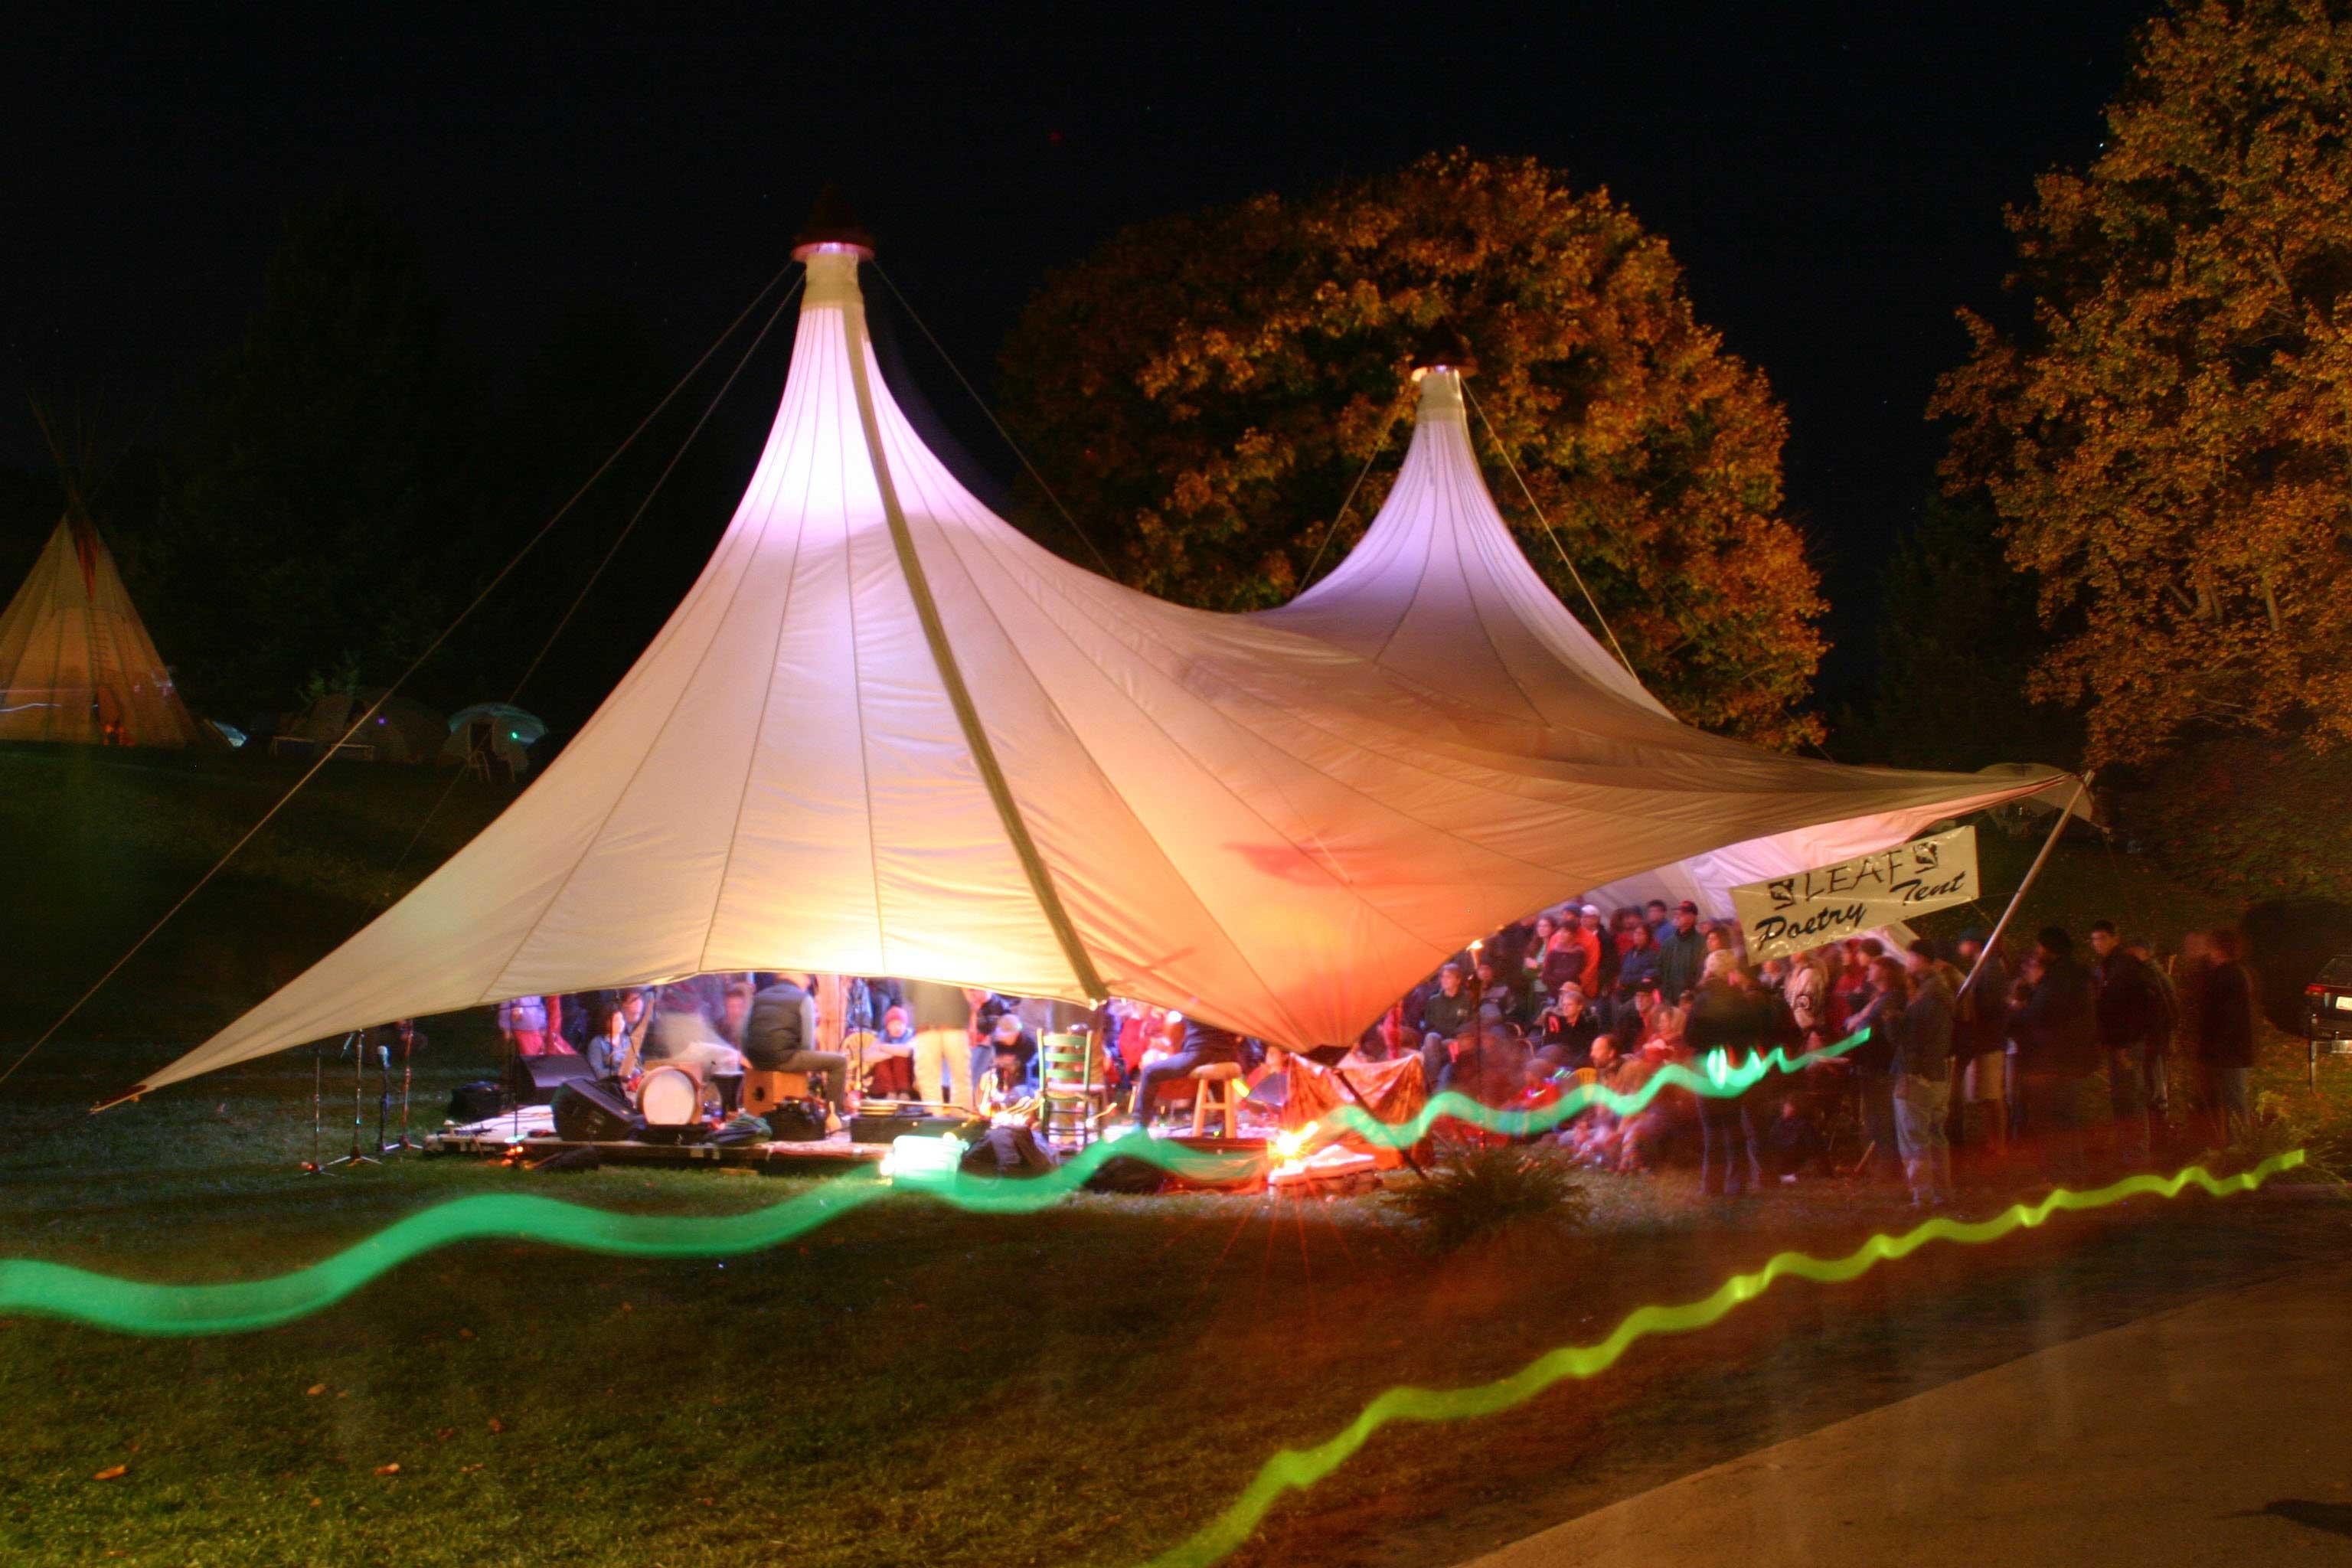 Artful Shelter